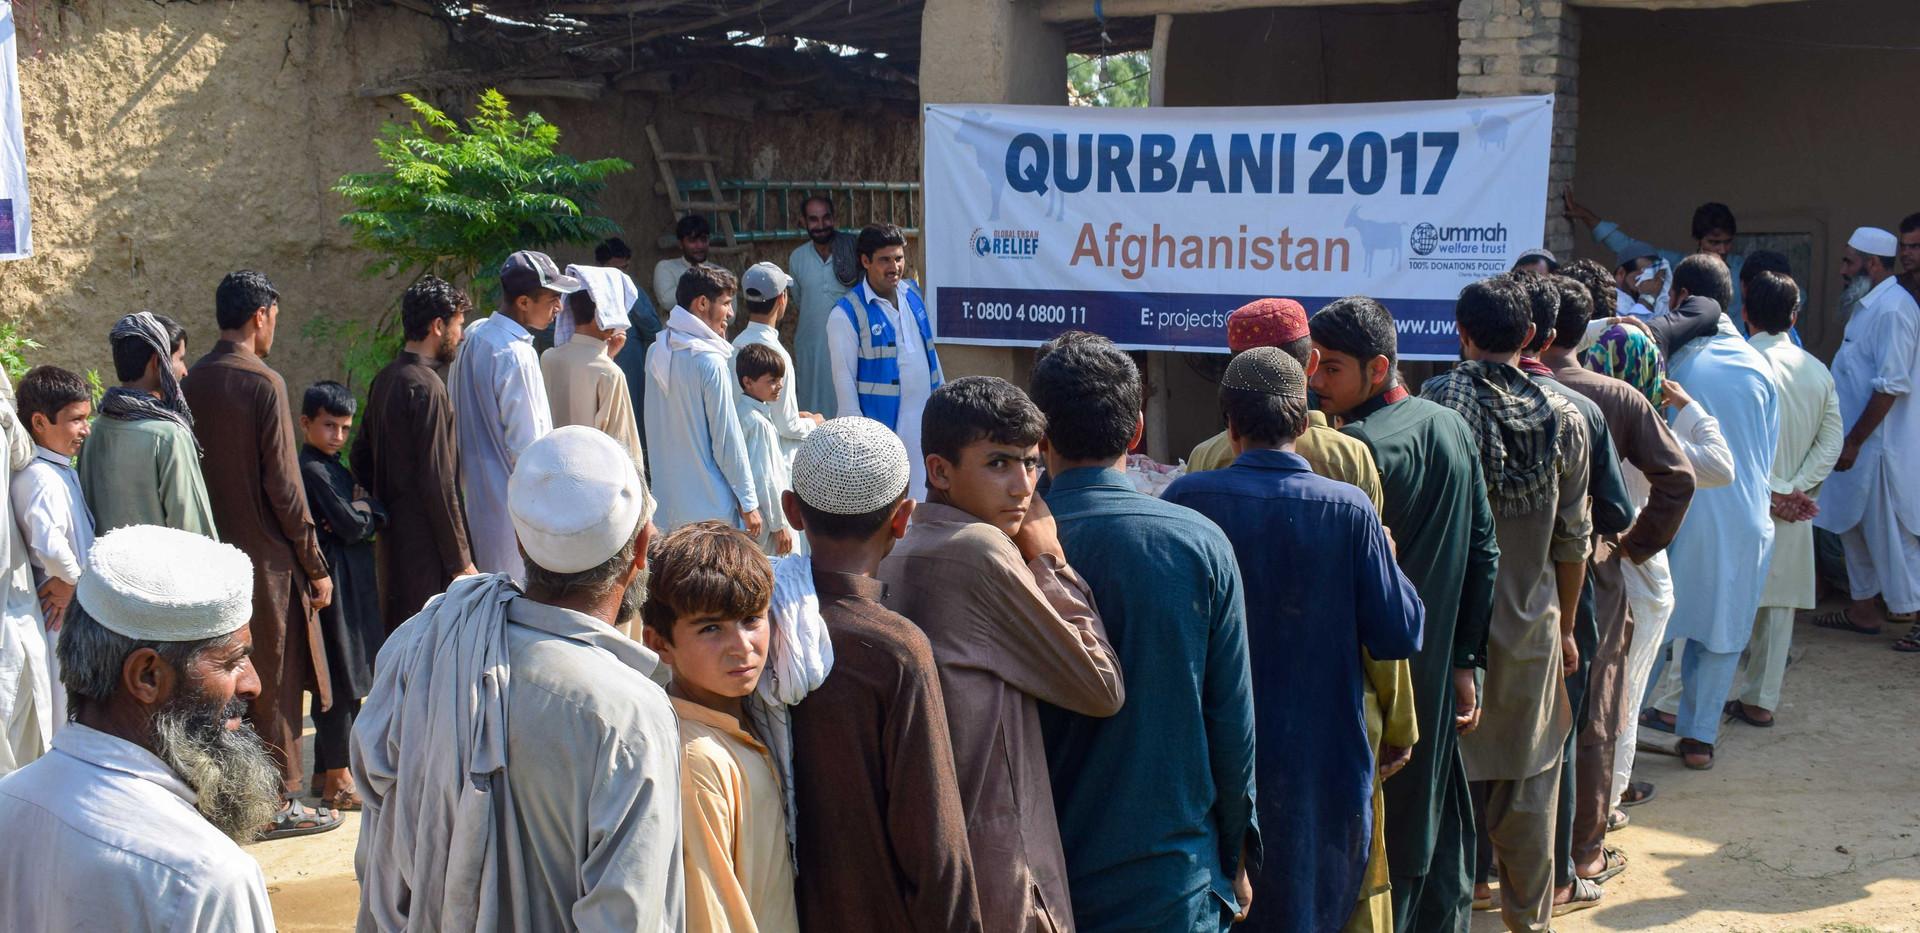 Qurban in Afghanistan 2017